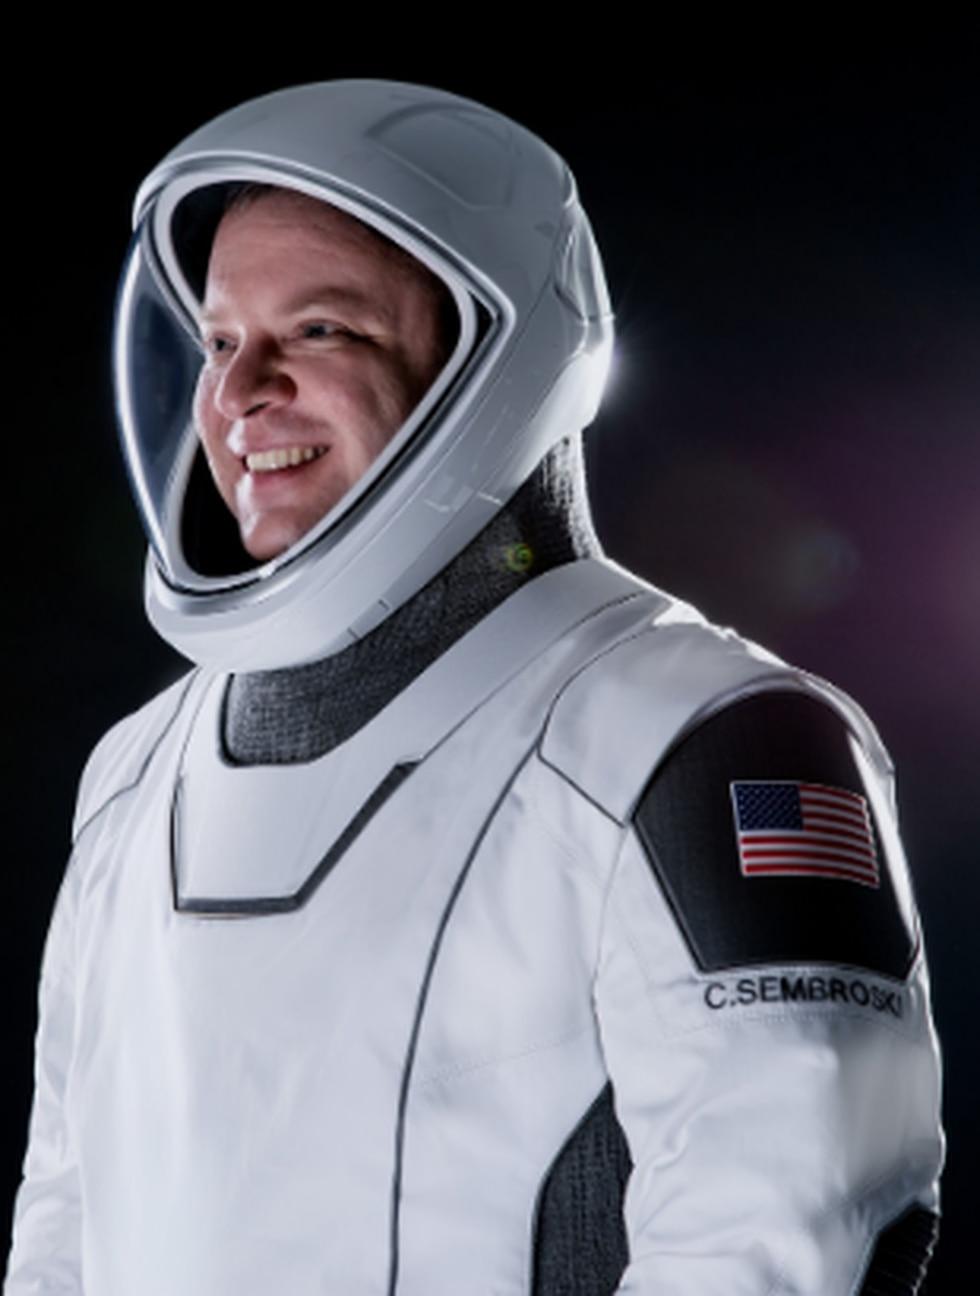 Chris Sembroski